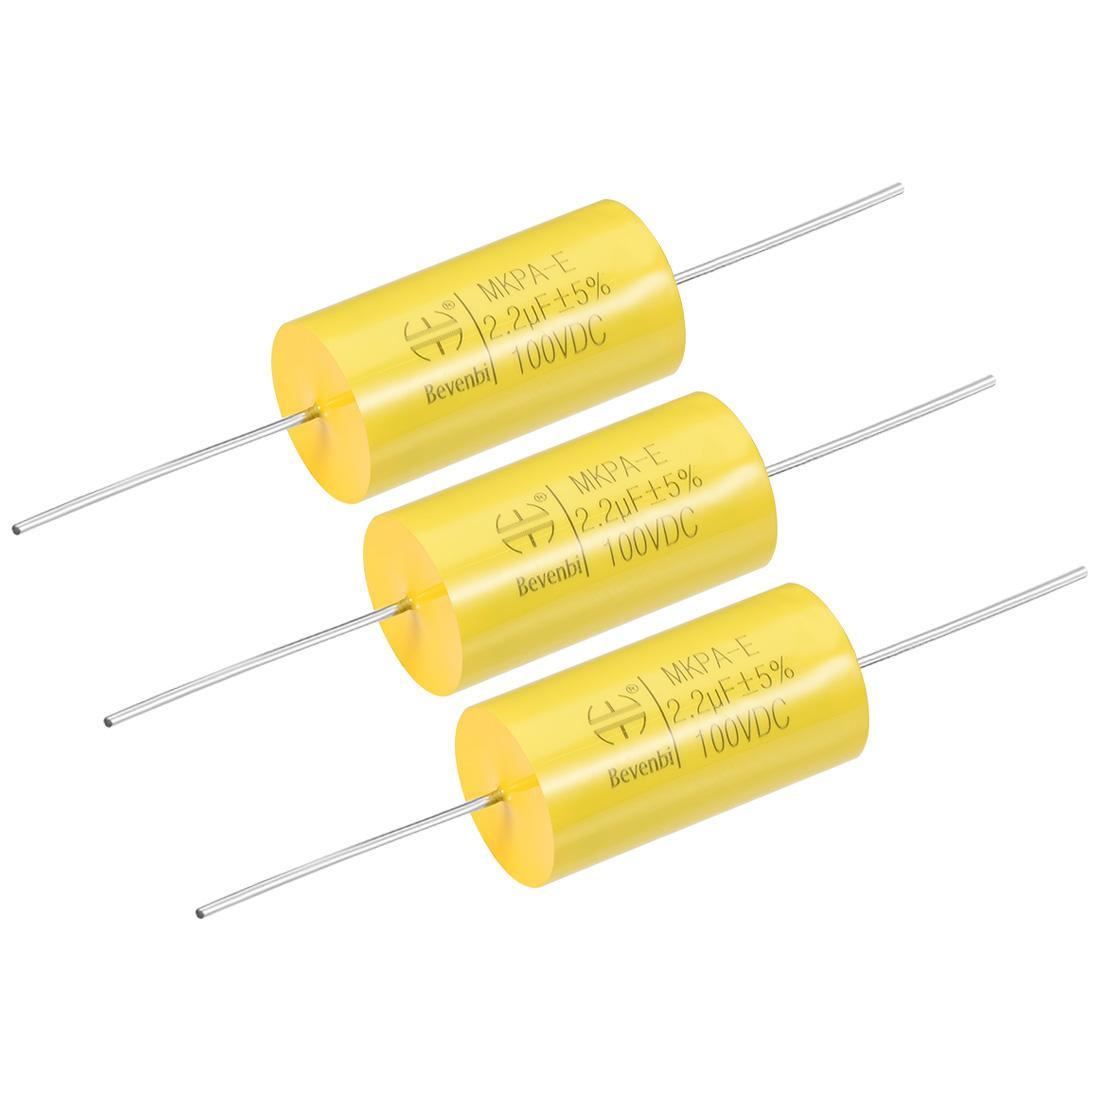 Film Capacitor 100V DC 2.2uF MKPA-E Round Polypropylene Capacitors Yellow 3pcs